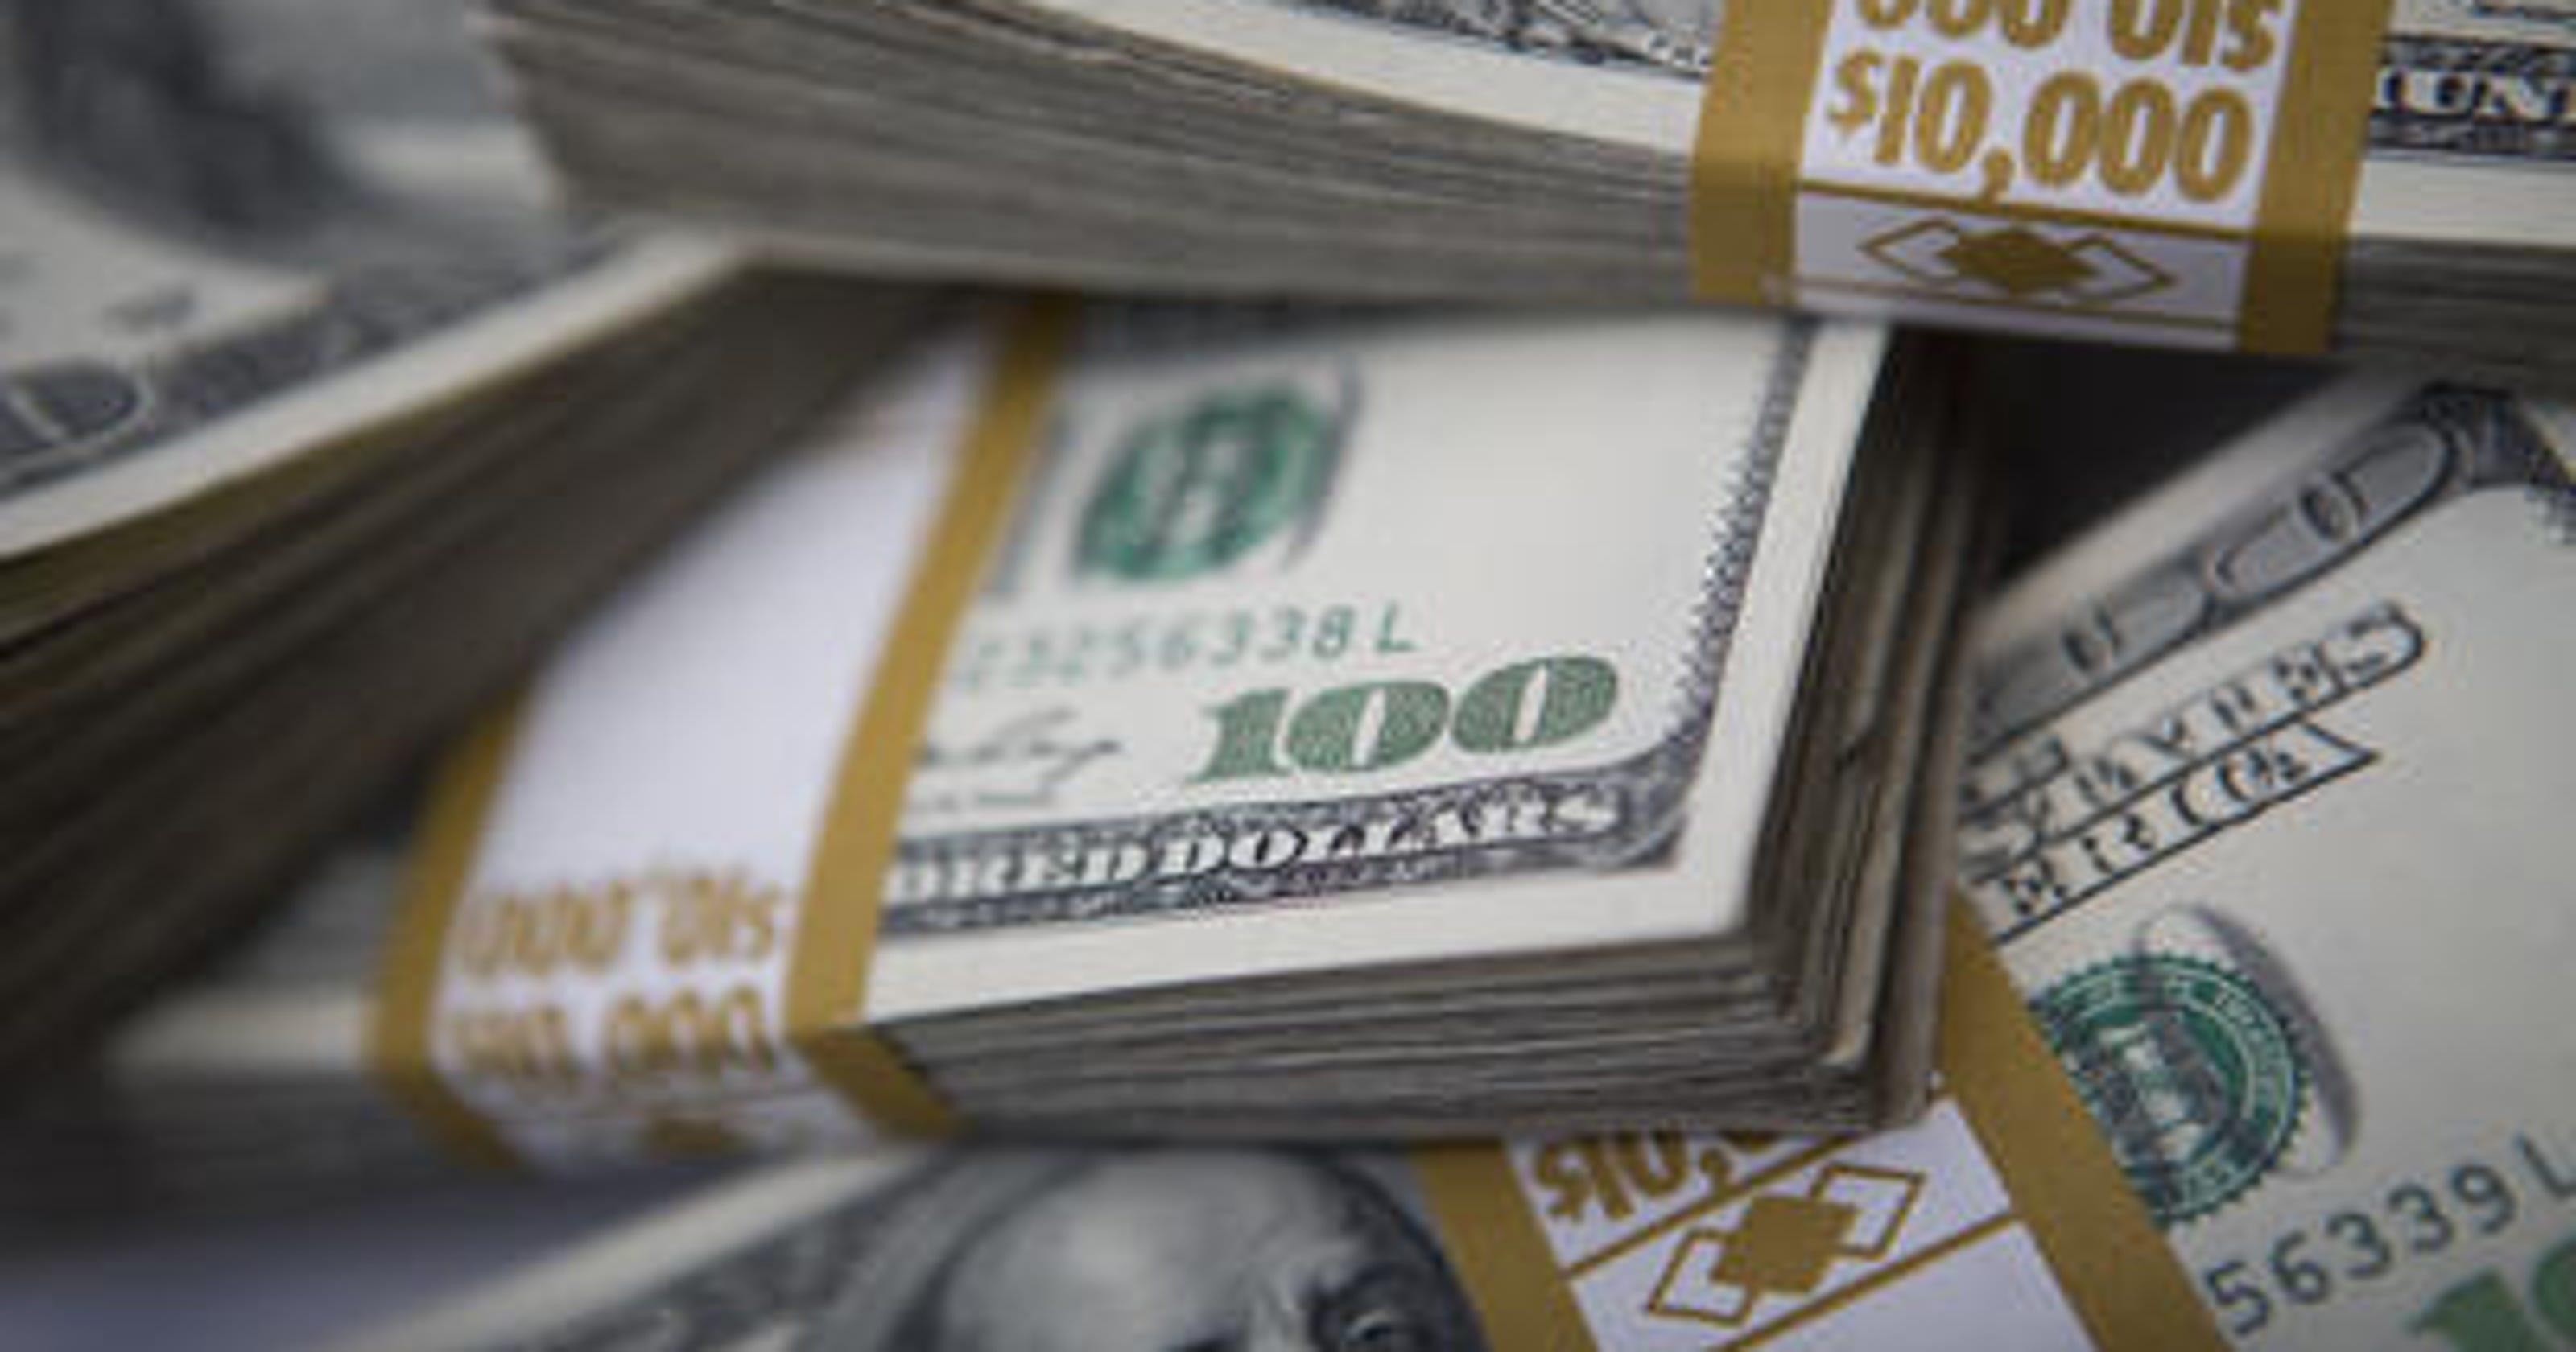 $1 5M lottery ticket sold in Monroe